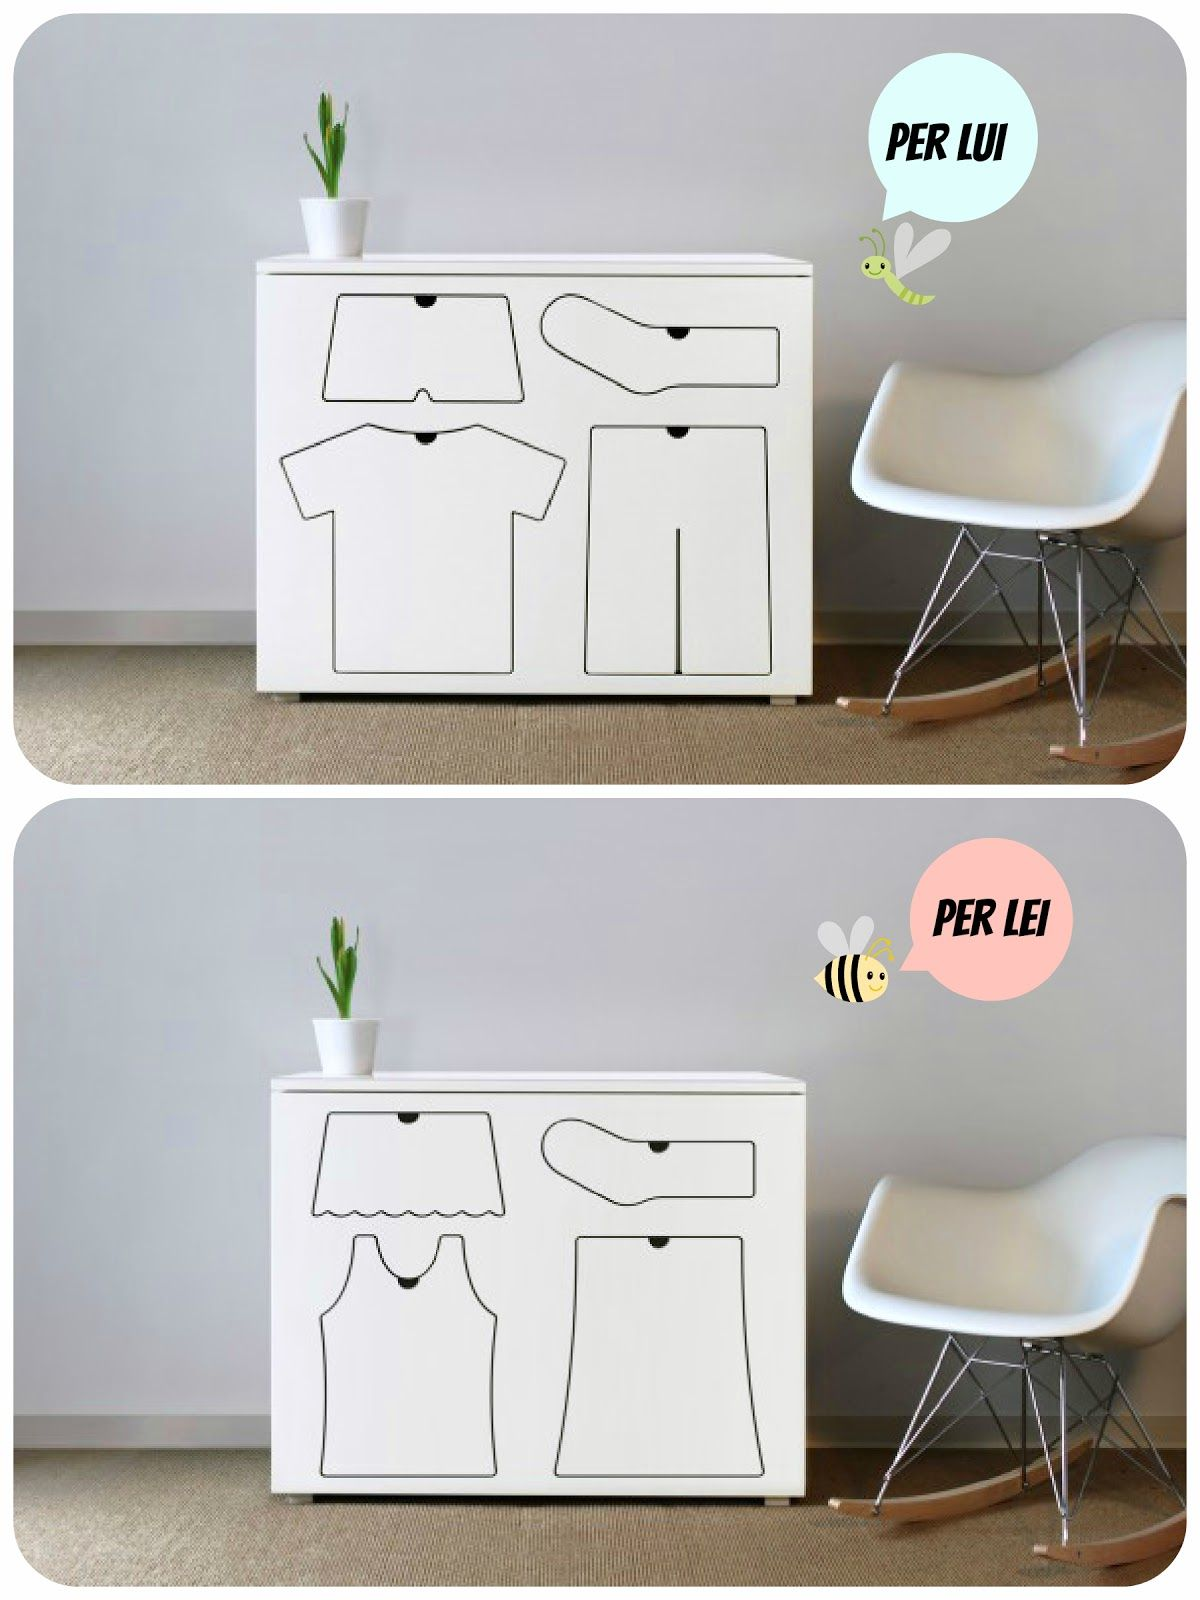 Tata unconventional design for kids children pinterest kids